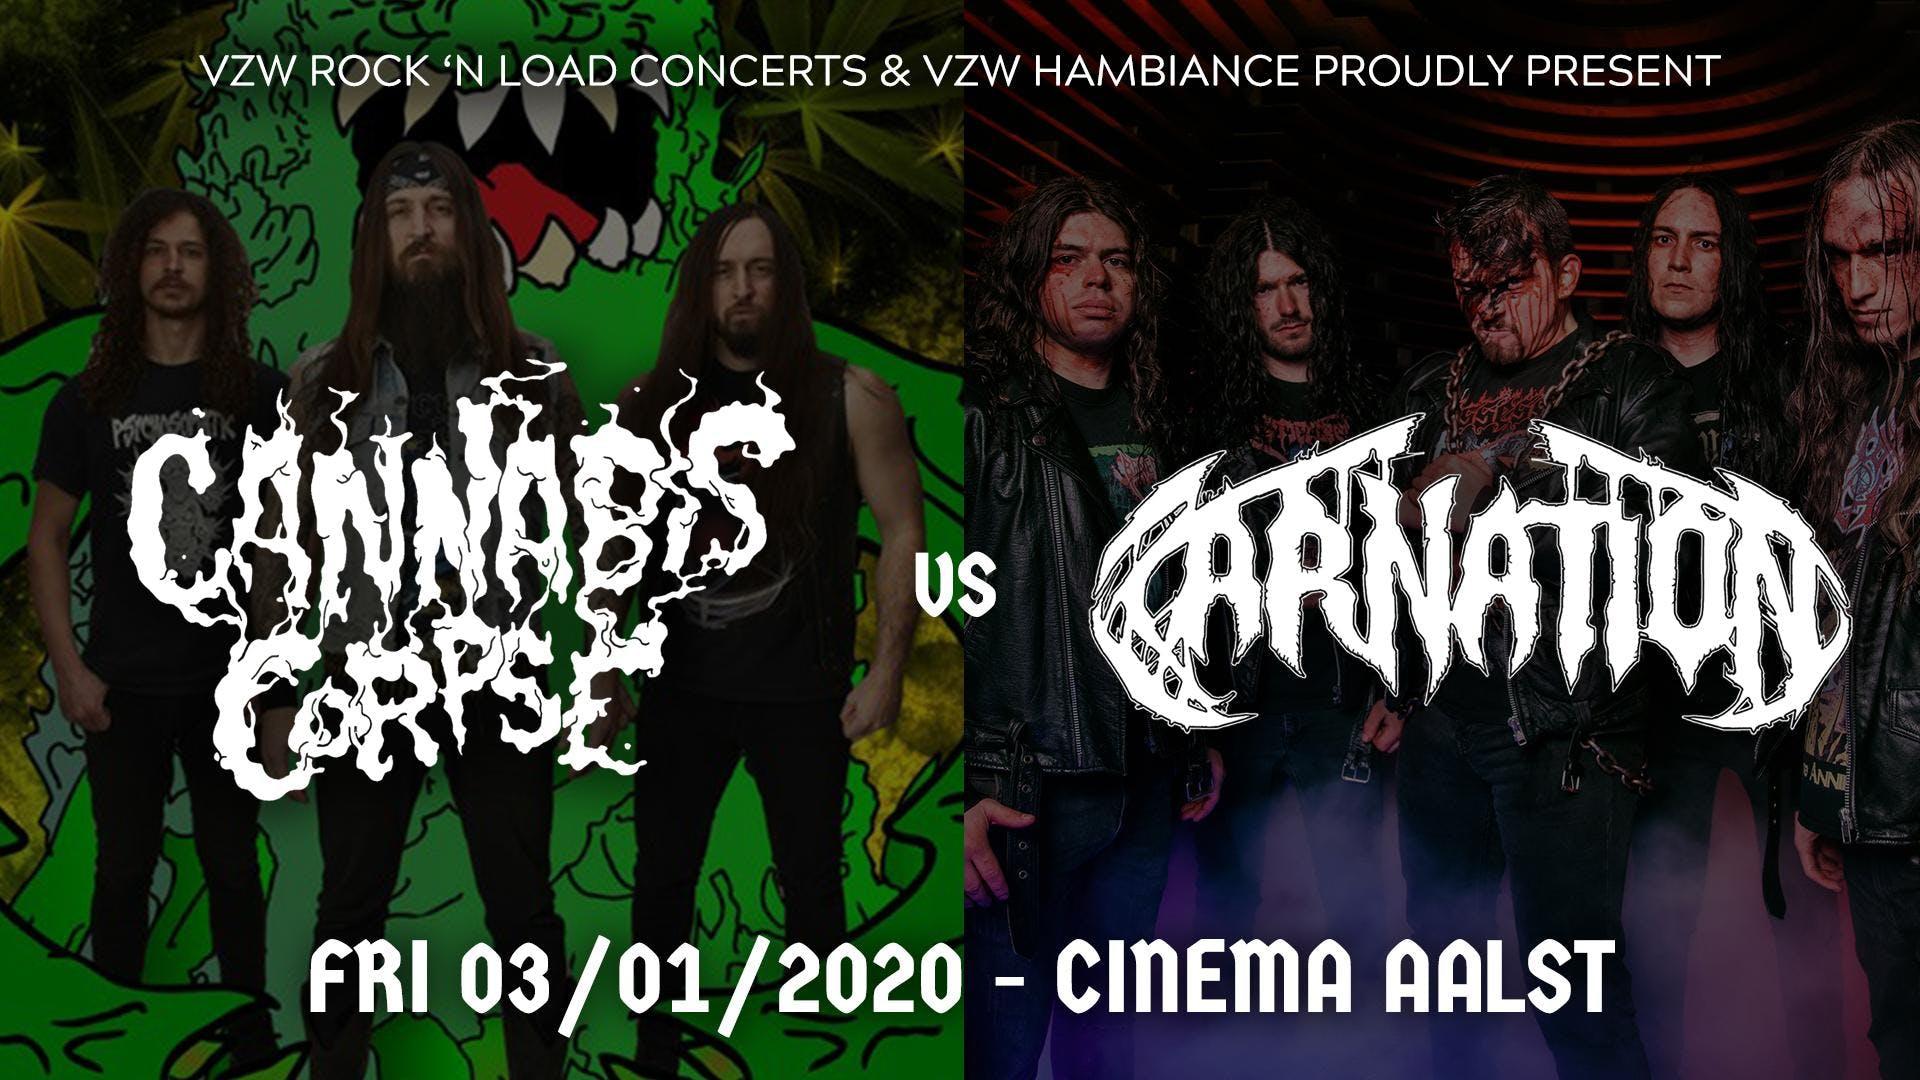 Cannabis Corpse / Carnation // Cinema, Aalst